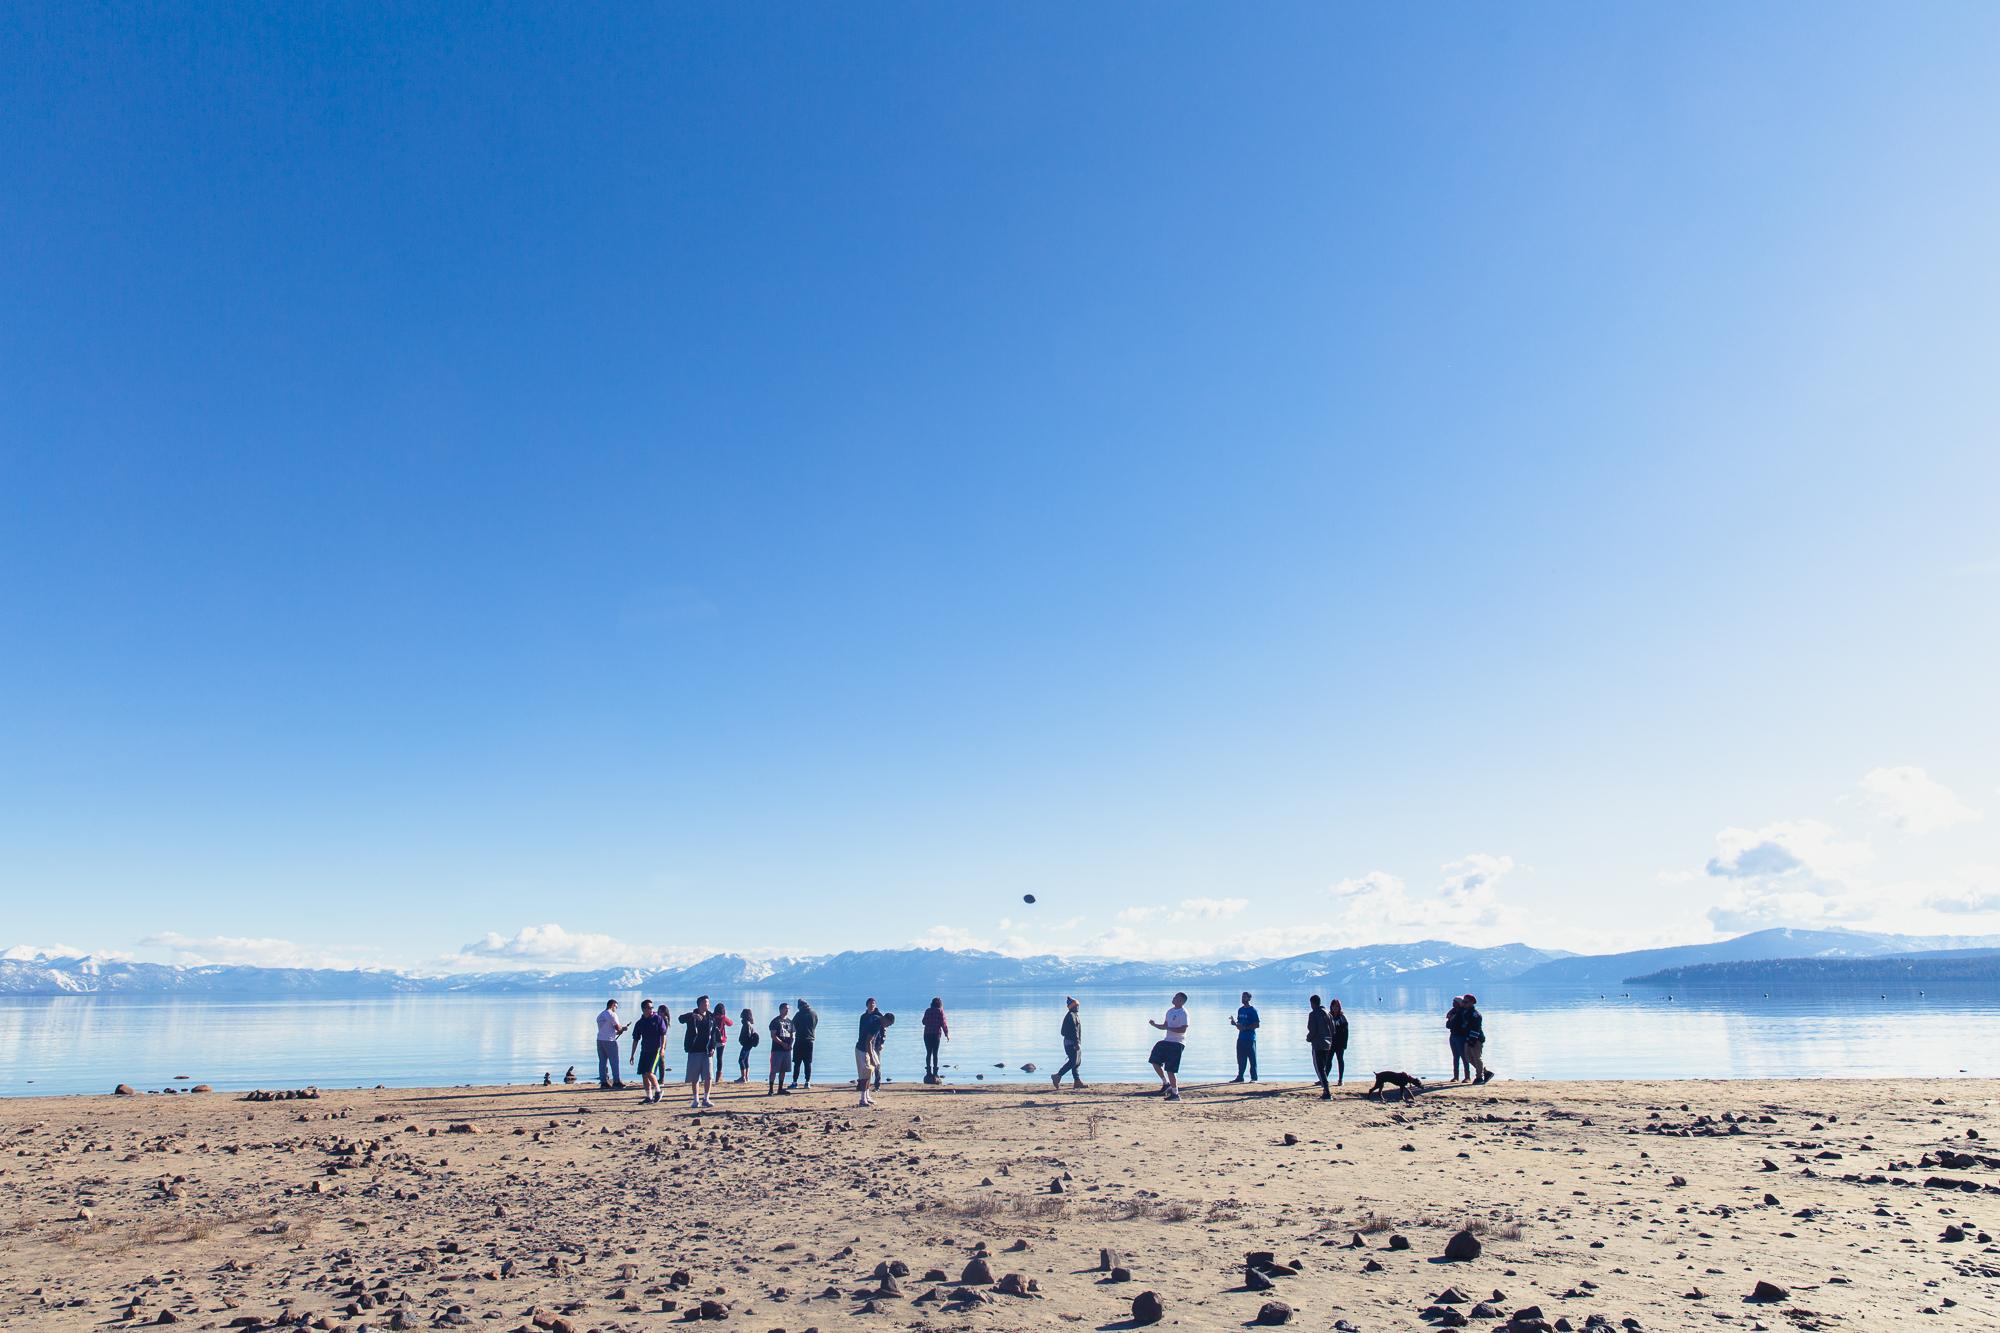 crew-and-tahoe-7.jpg